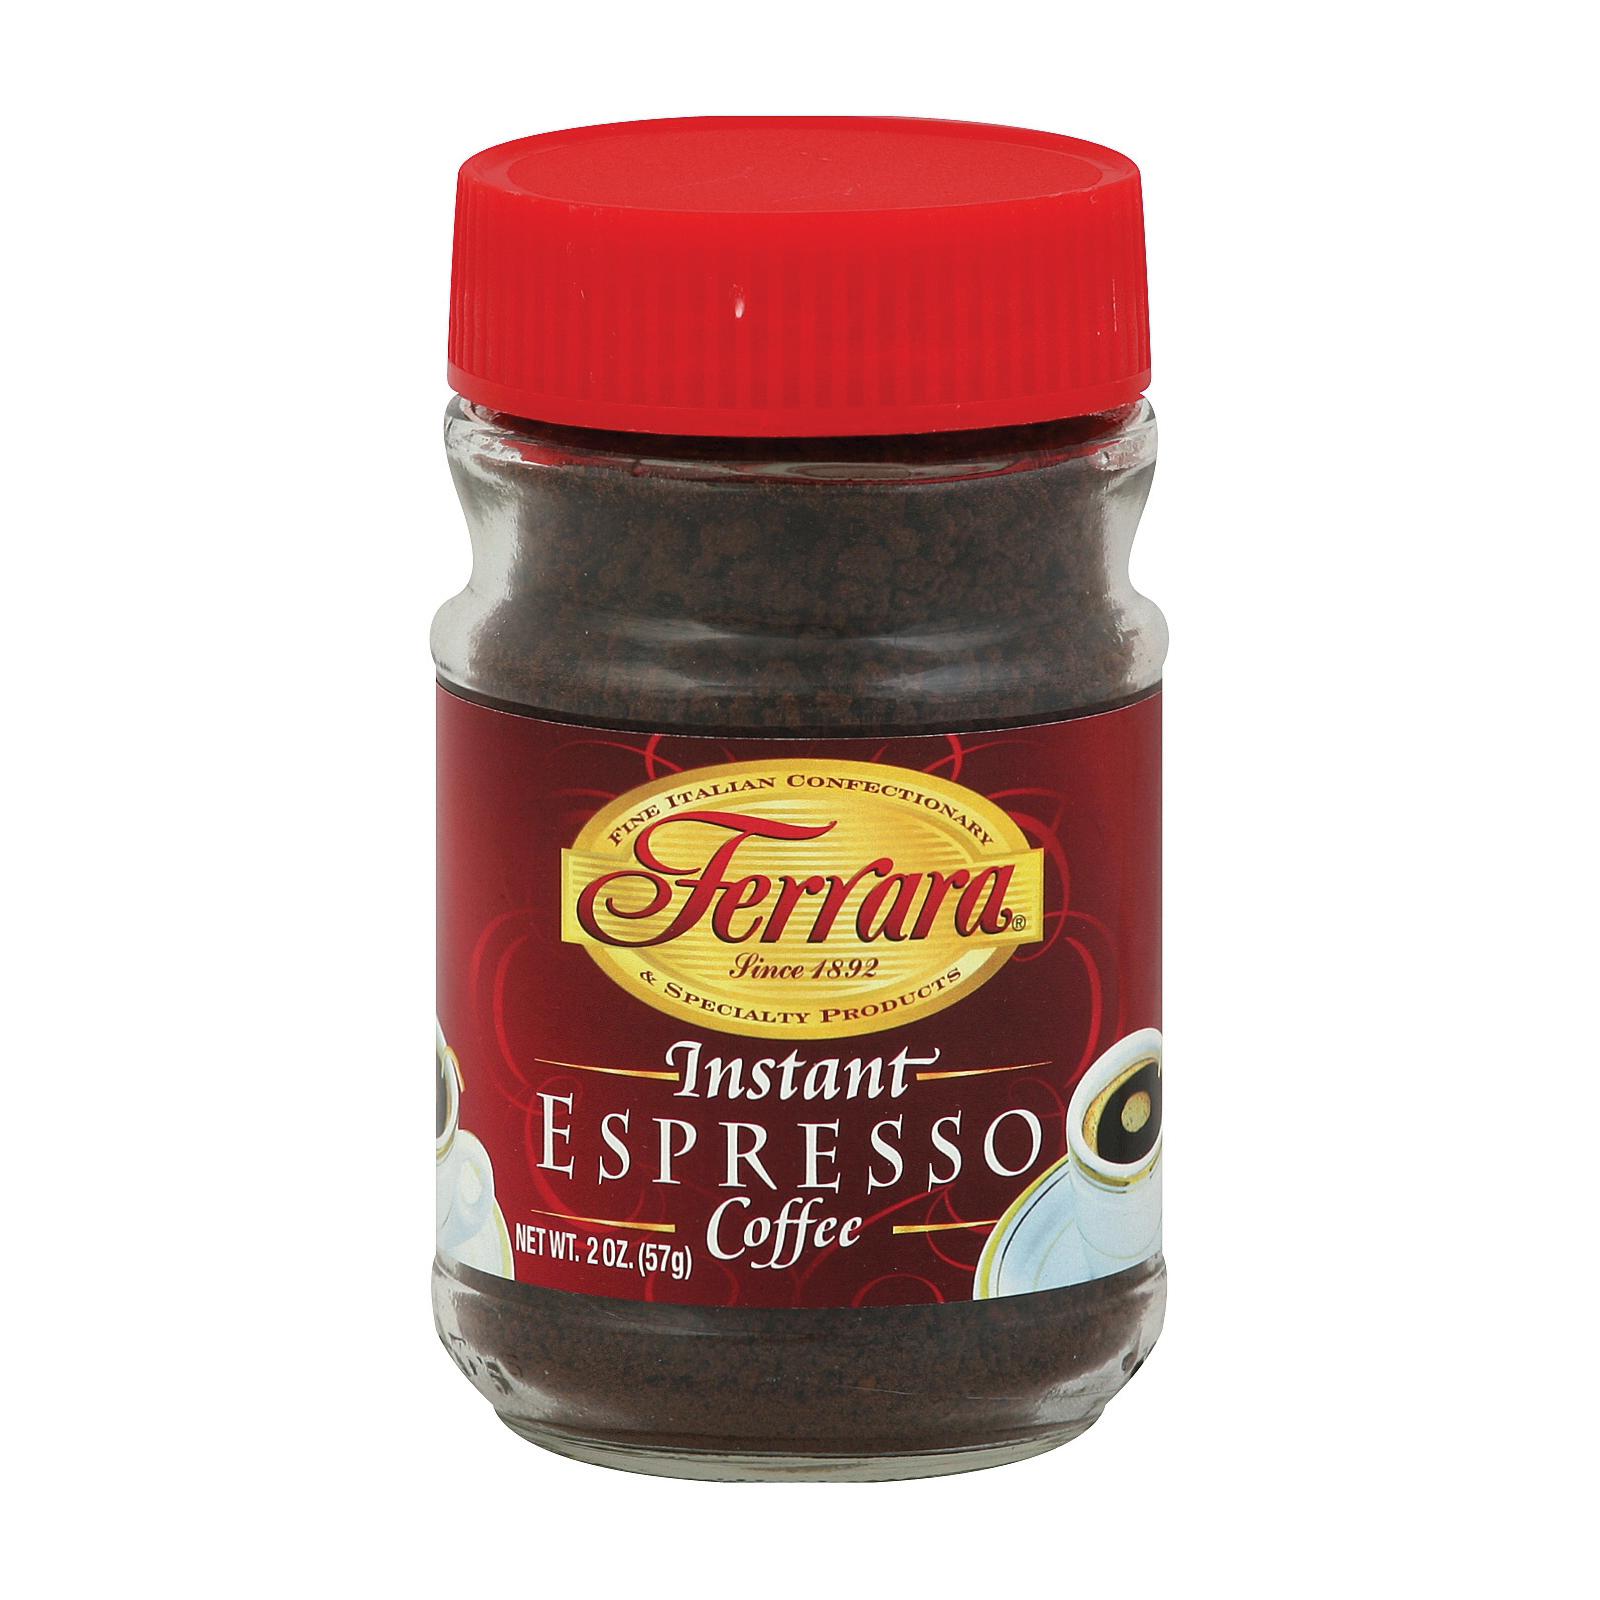 Ferrara Instant Espresso Coffee - Case of 24 - 2 oz.